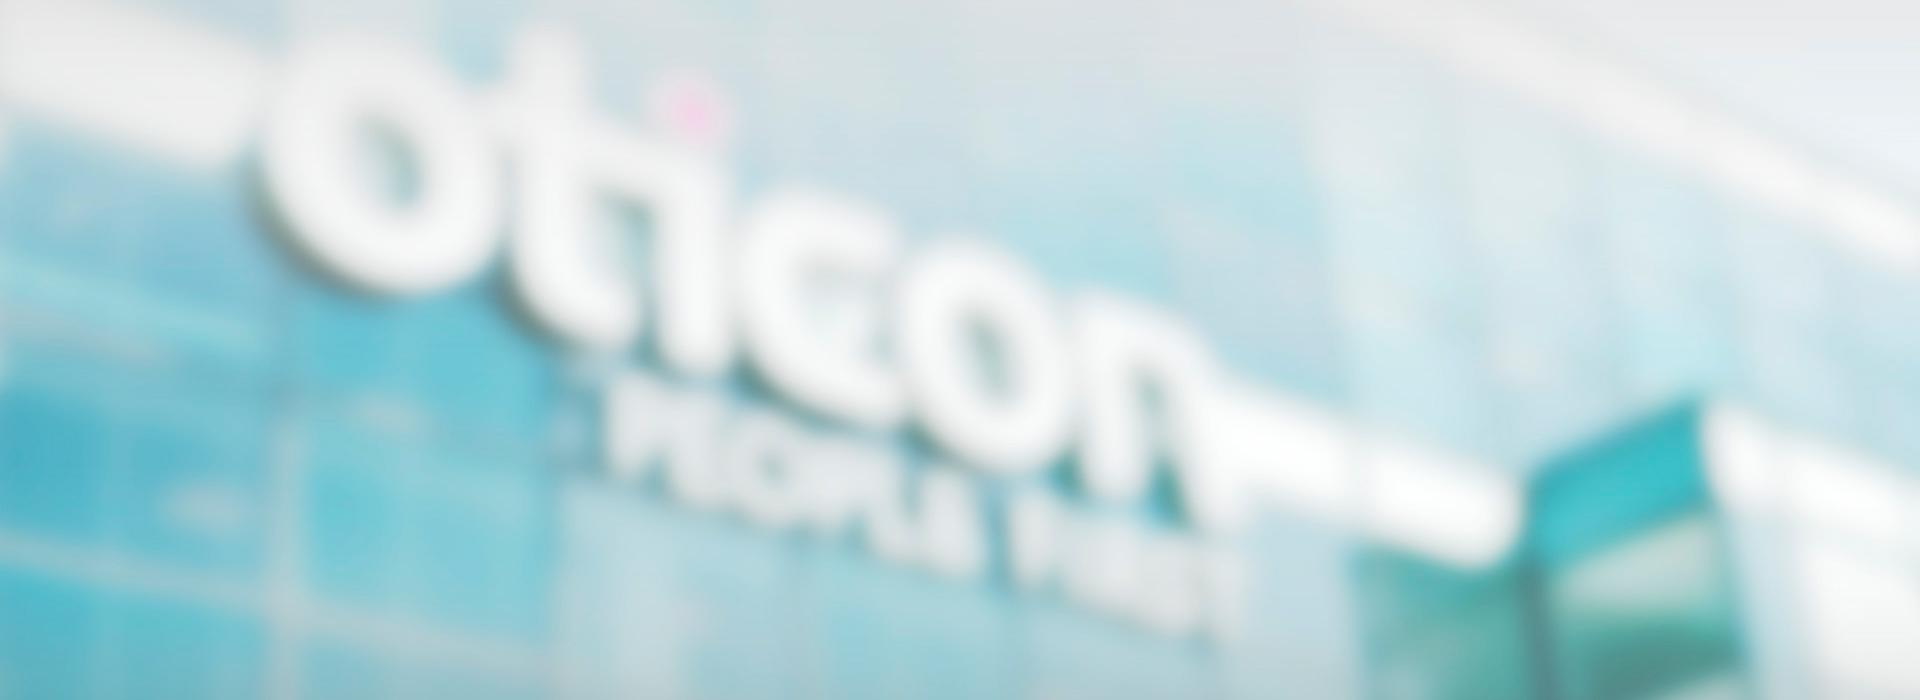 blurry oticon logo